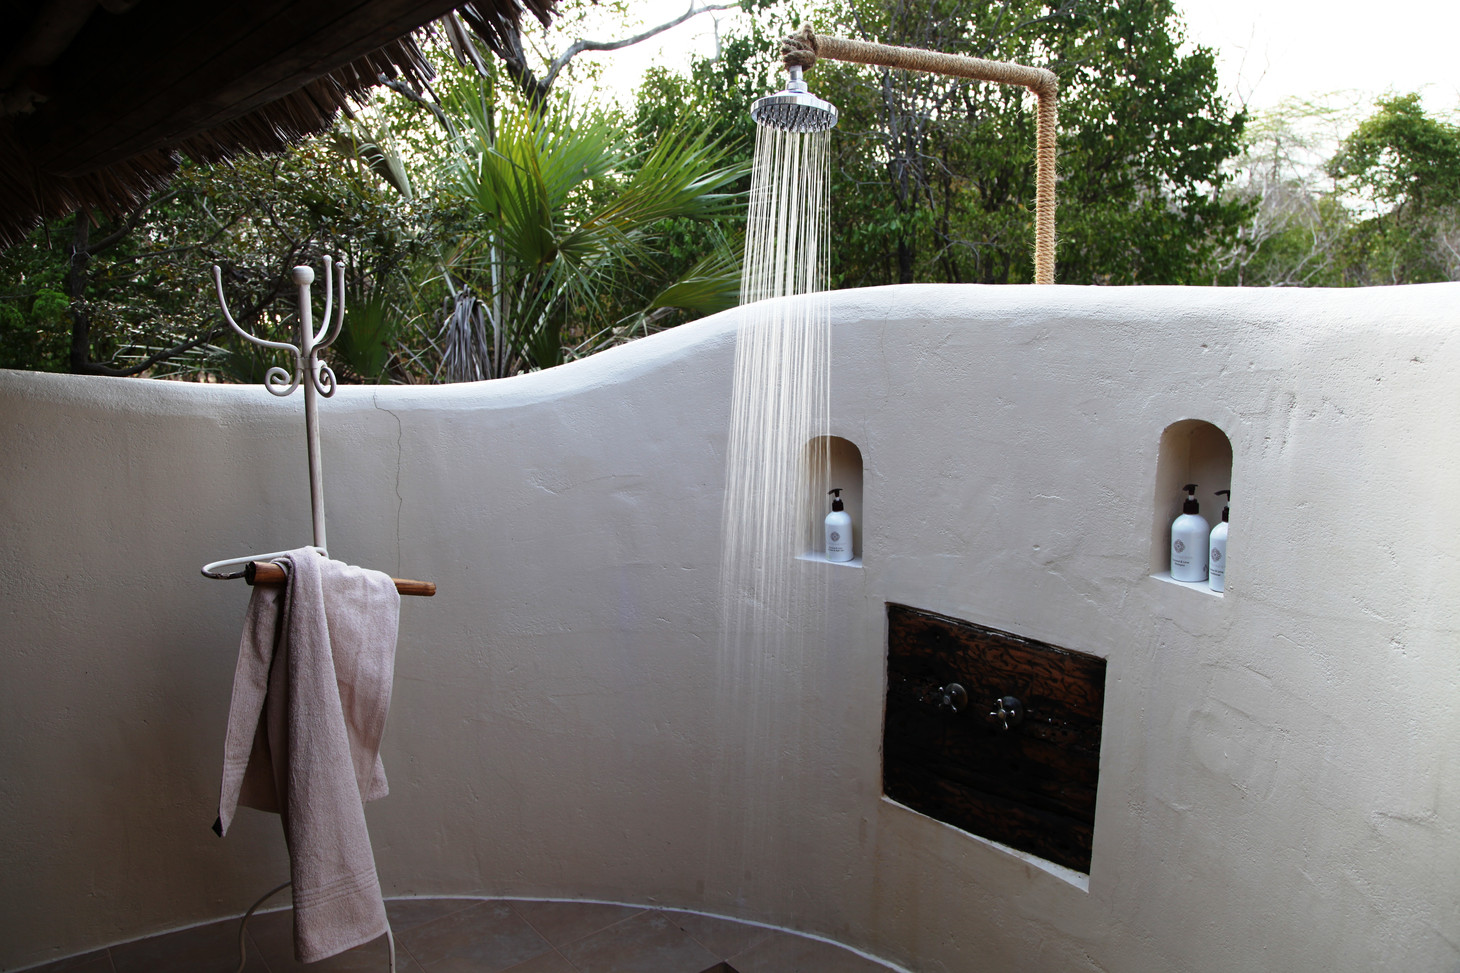 Outdoor showering at Siwandu, Nyerere, Selous